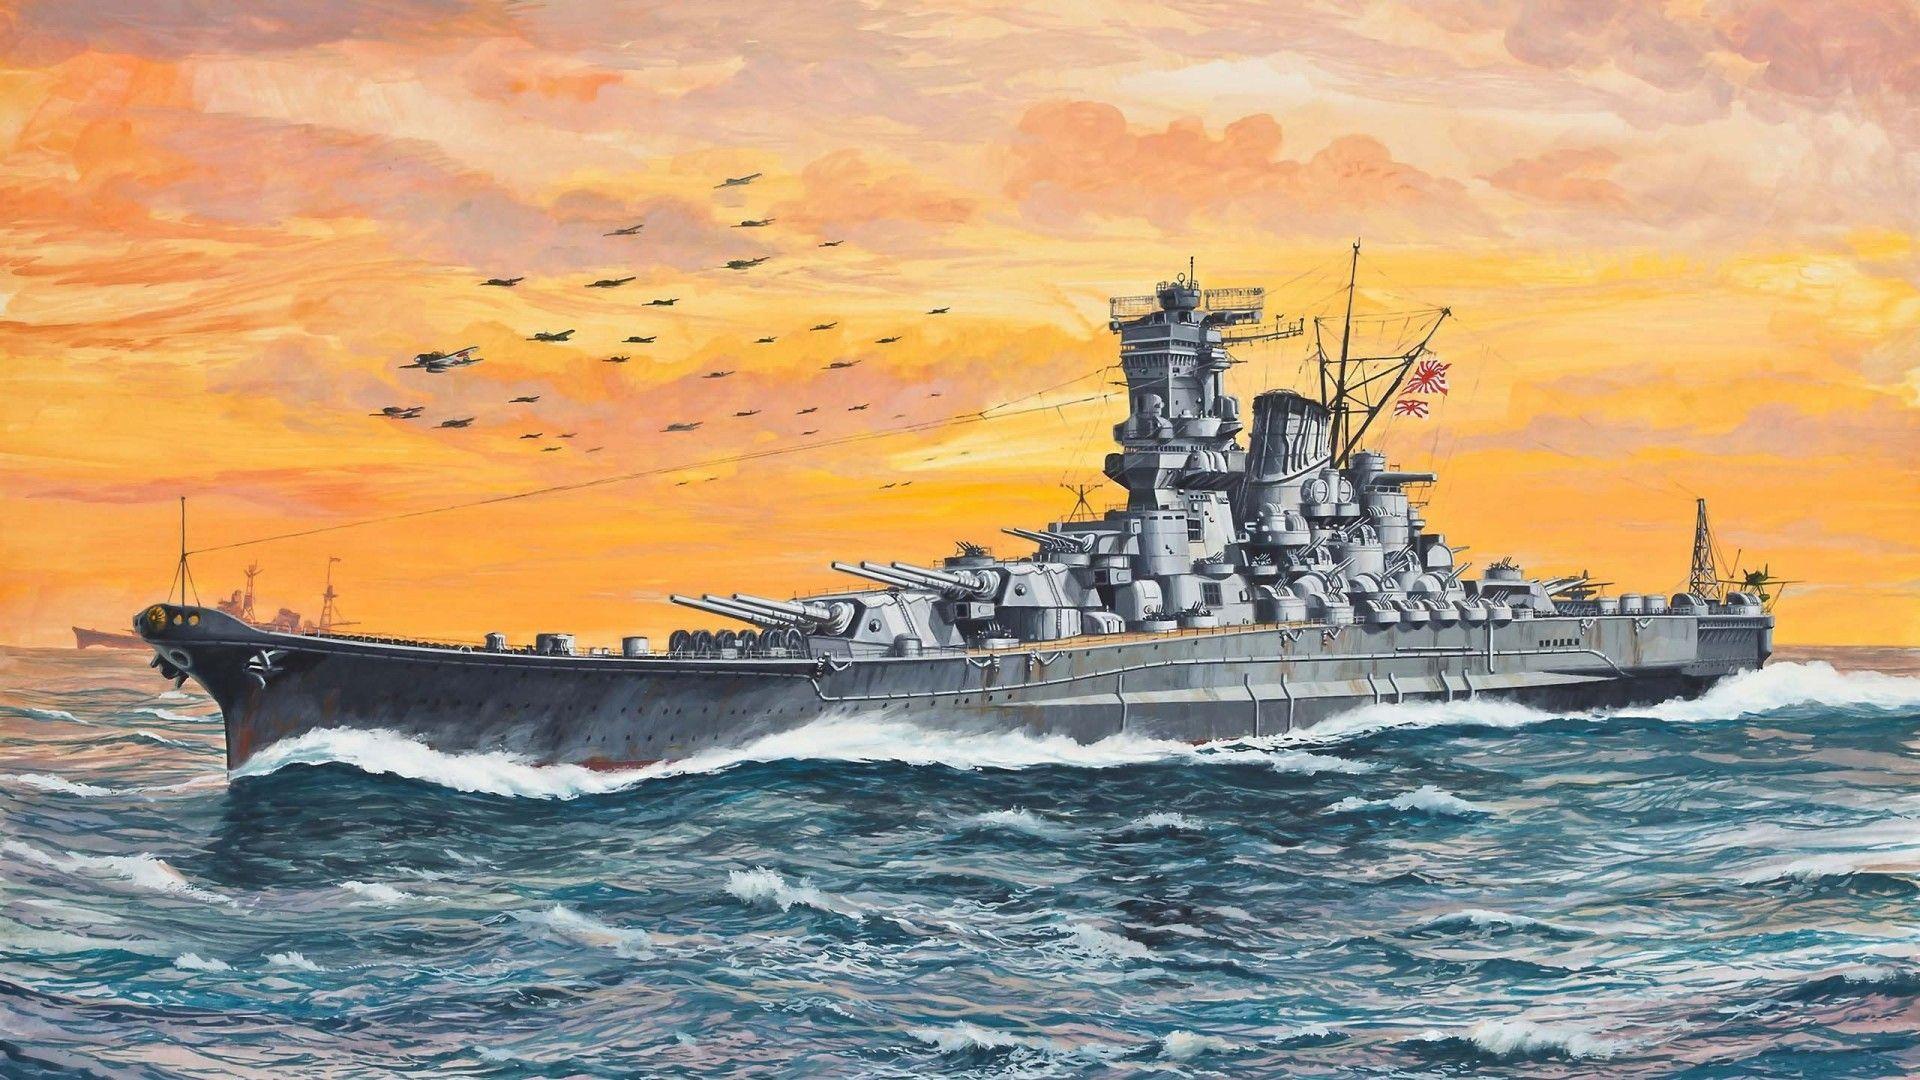 US Navy Ships Wallpapers - Wallpaper Cave